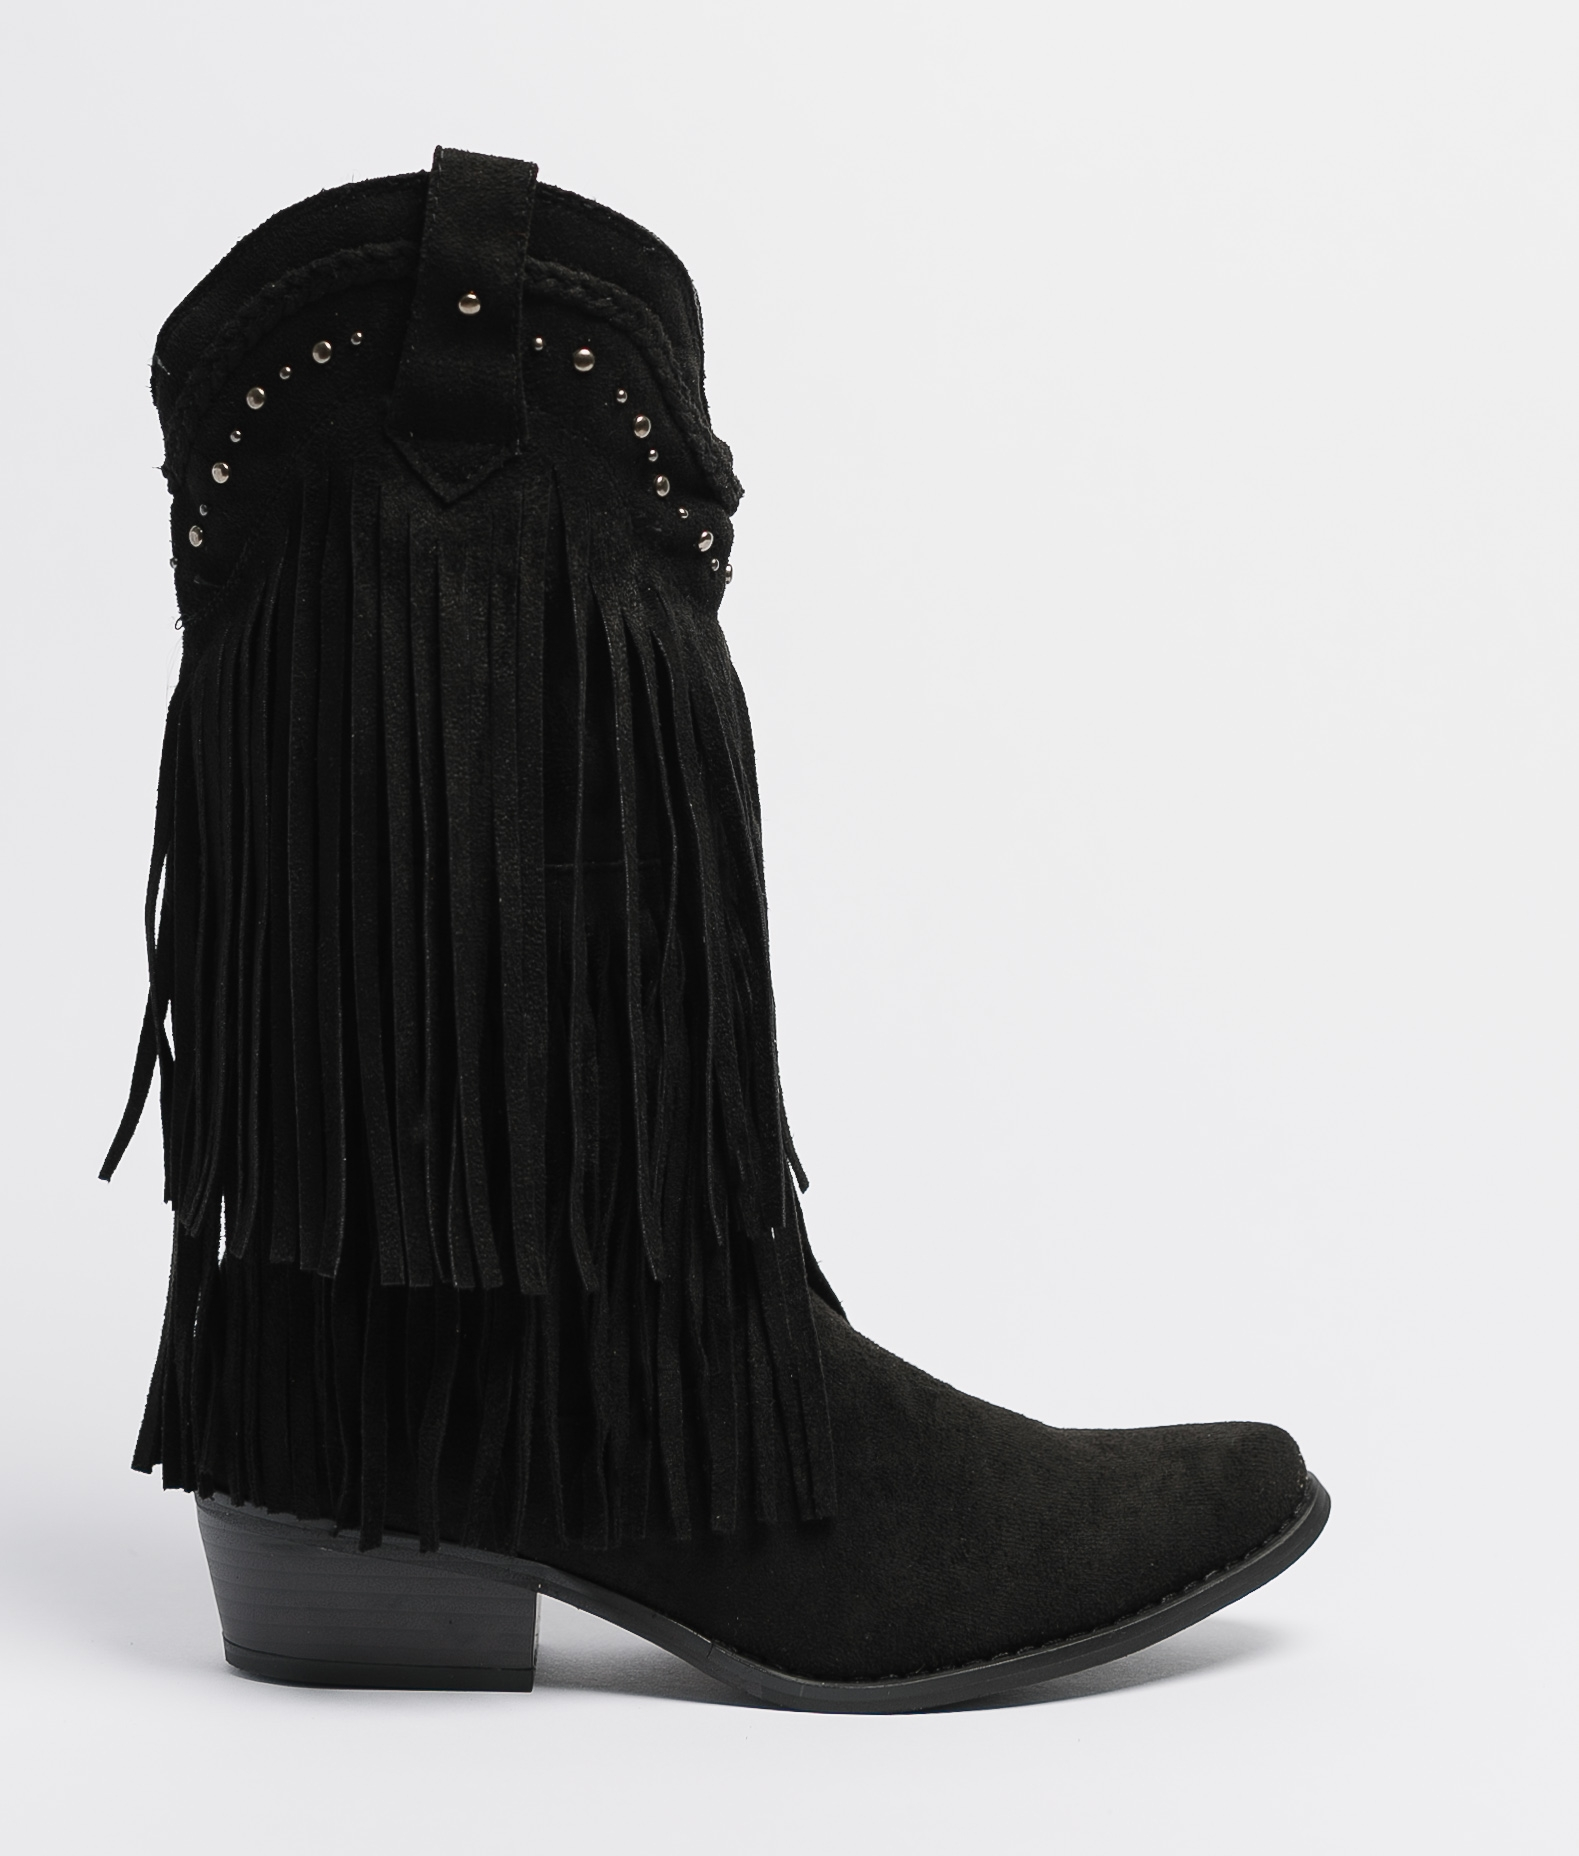 Knee-length Boot Leris - Black